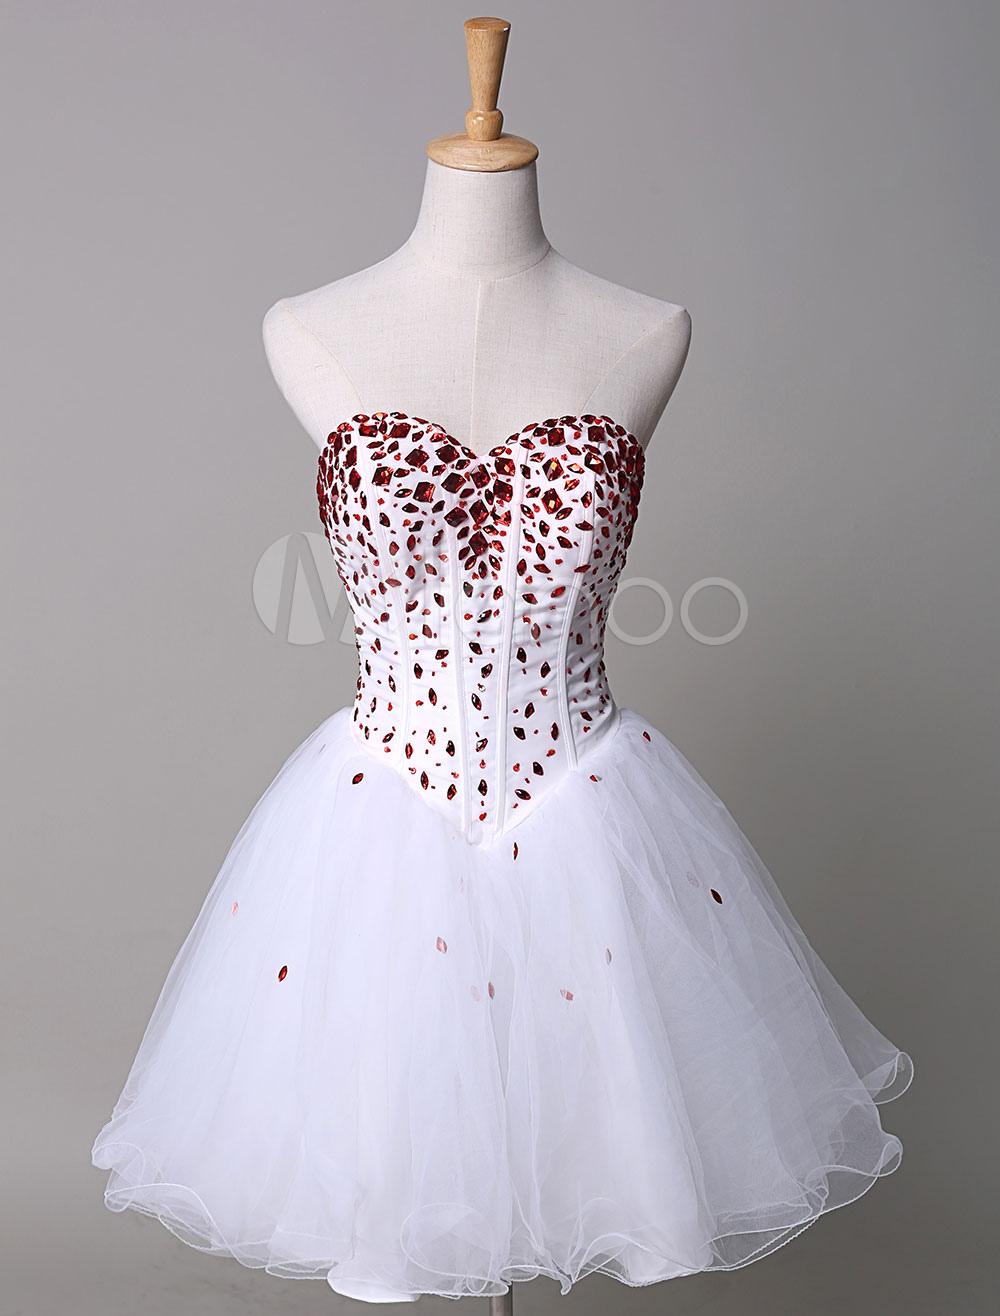 Strapless Prom Dress Rhinestone Beading A-Line Tulle Short Homecoming Dress